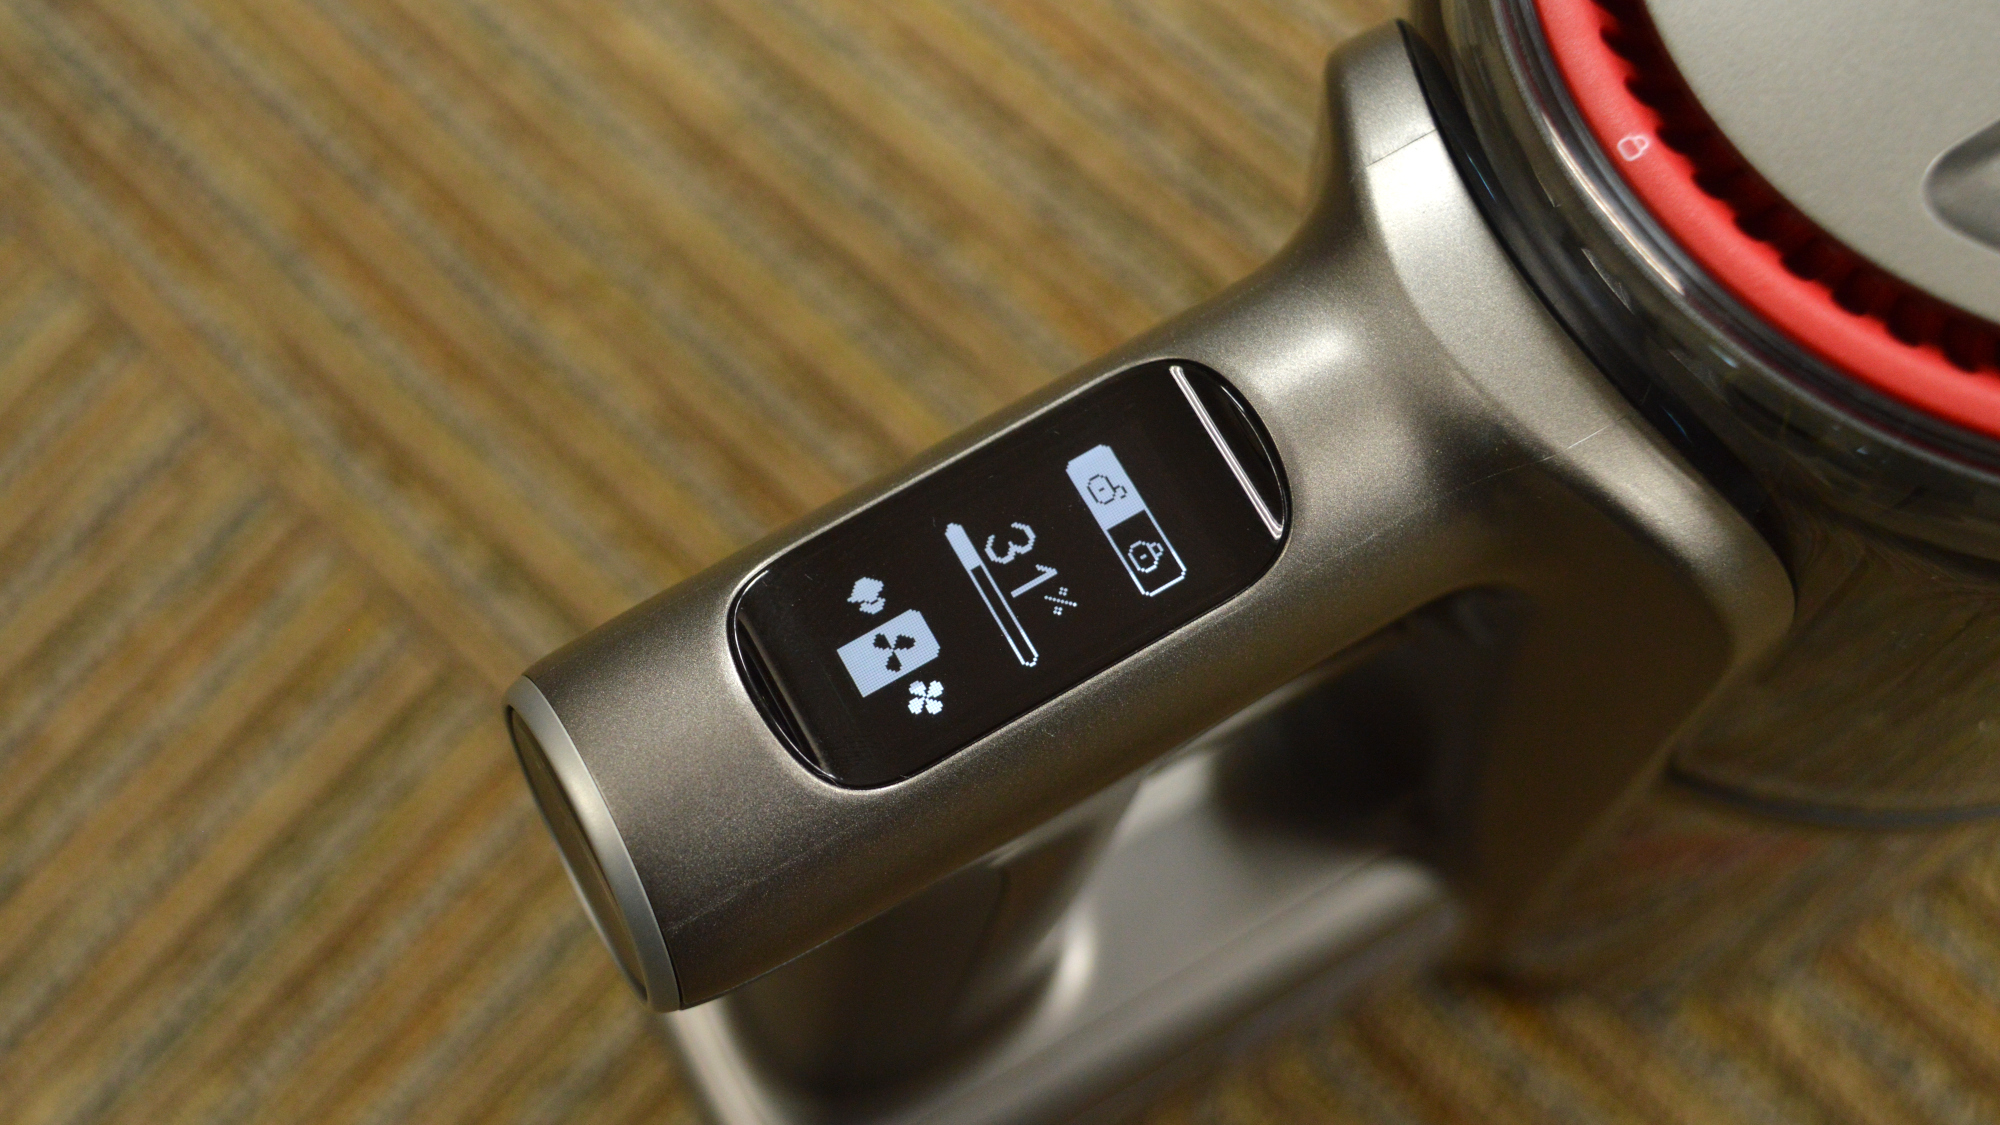 Roborock H7 Cordless Vacuum Display